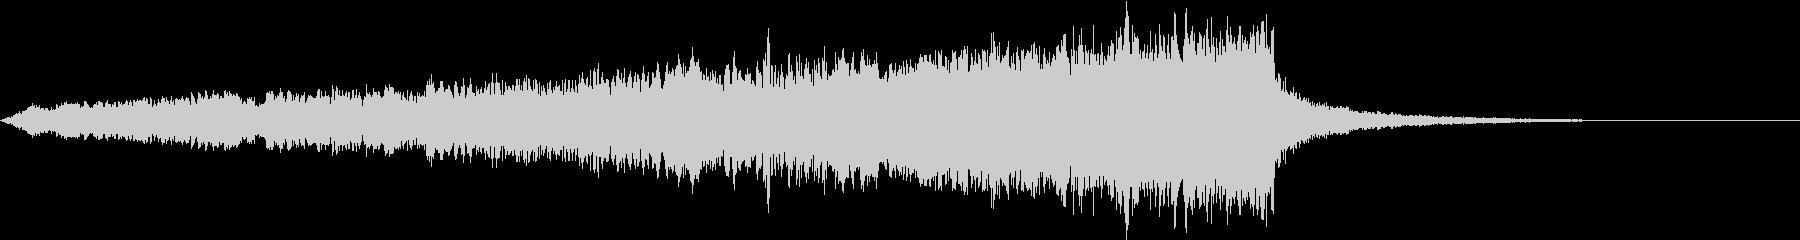 CINEMATIC RISER_28の未再生の波形